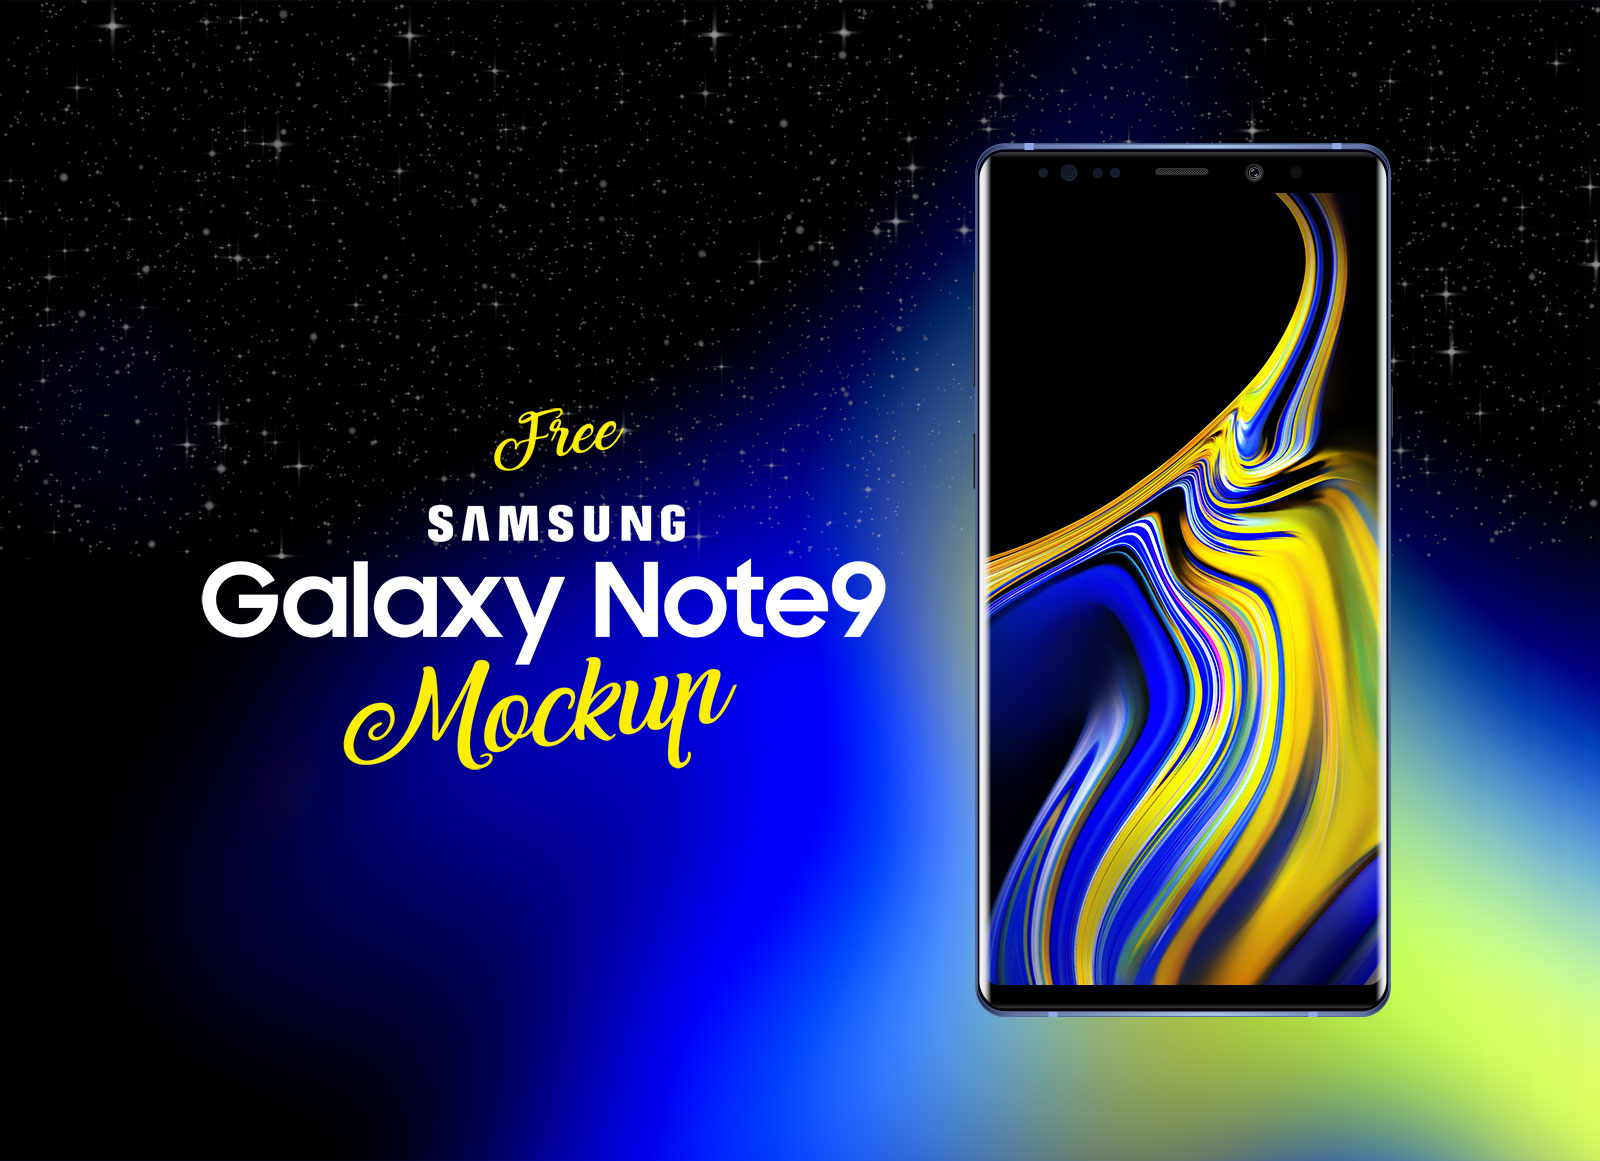 Free-Samsung-Galaxy-Note-9-Mockup-PSD